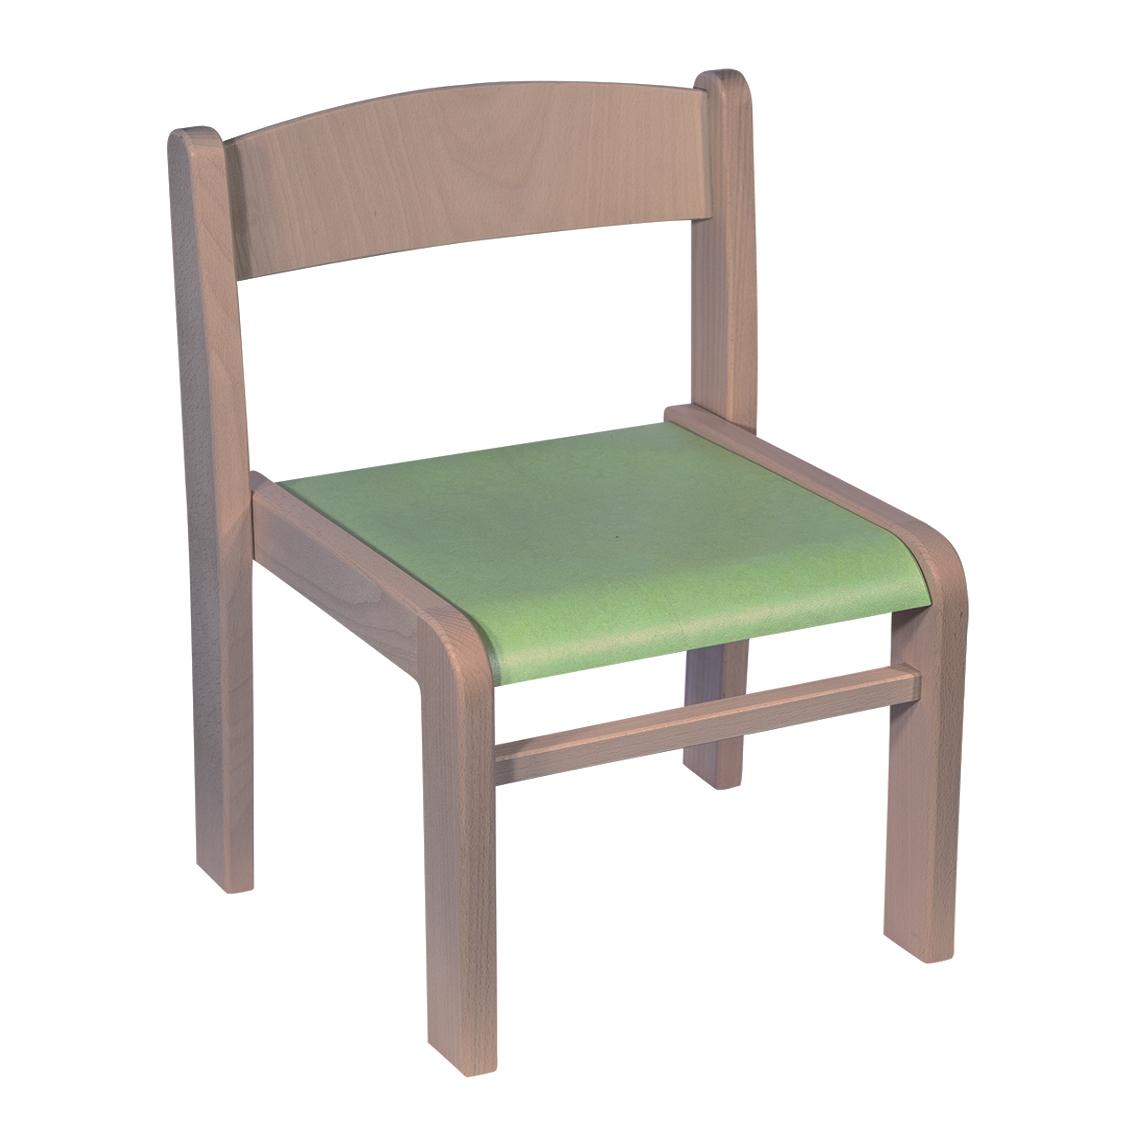 Chairs Elizabeth Comfort Taed Cz